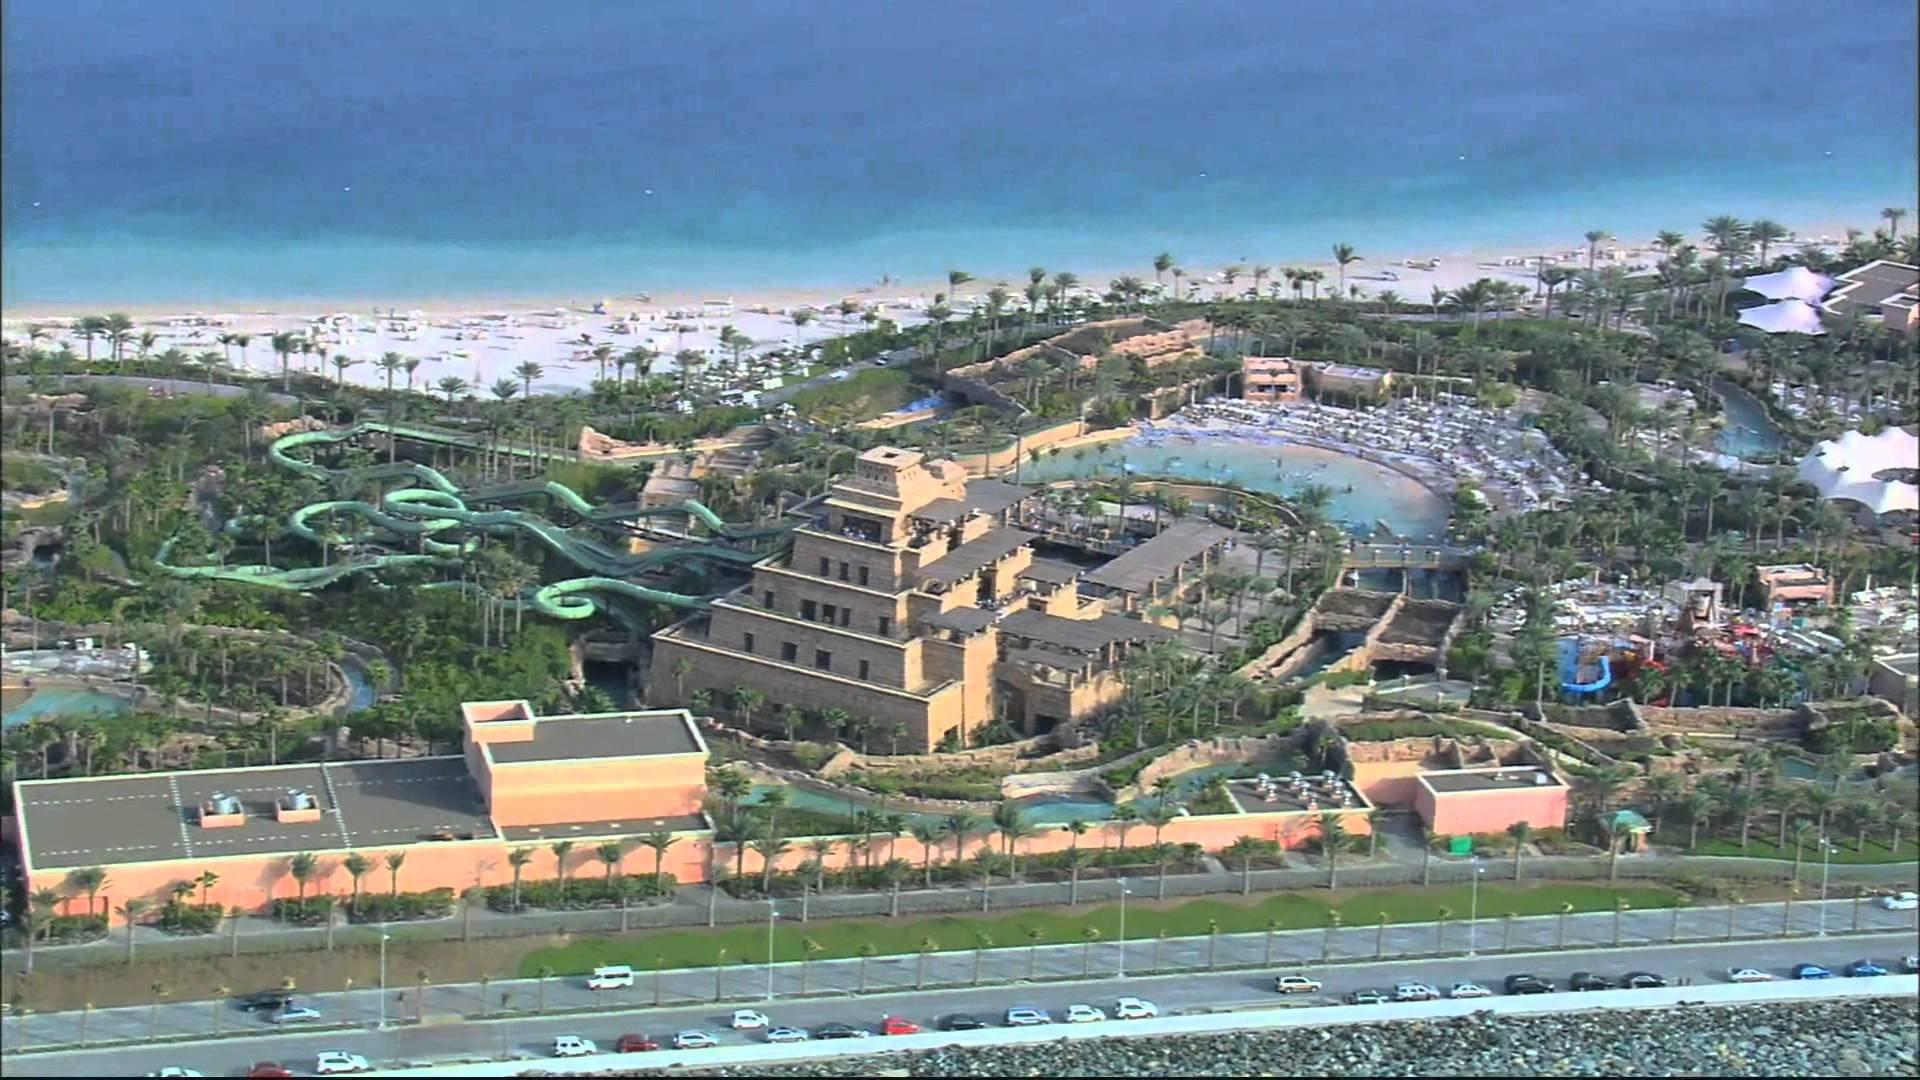 palm jumeirah wallpaperjpg - photo #36